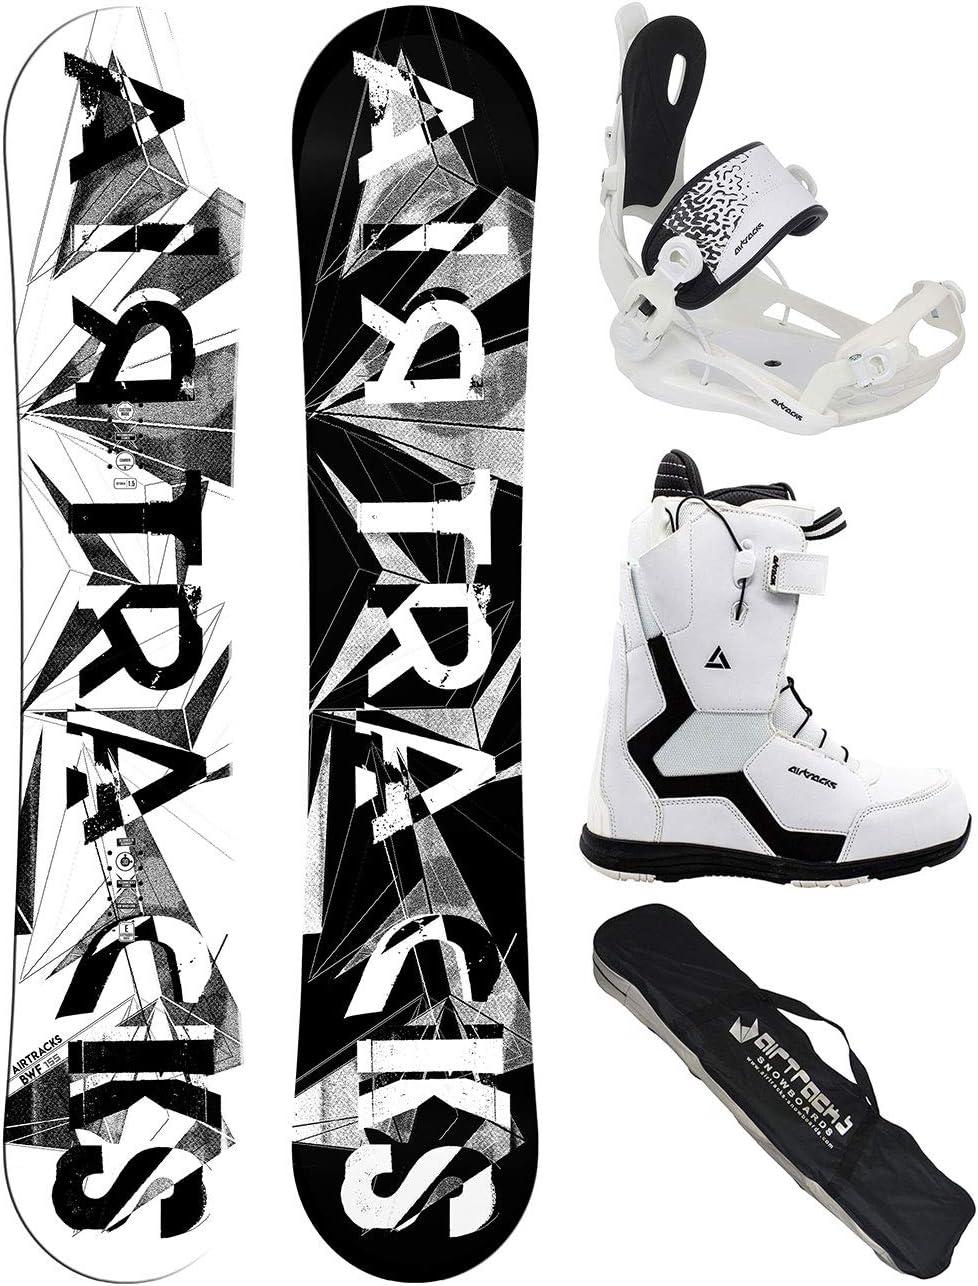 Snowboard Bindung Master Fastec Sb Bag // 140 145 150 155 cm Airtracks Damen Snowboard Set//BWF Lady Snowboardboots